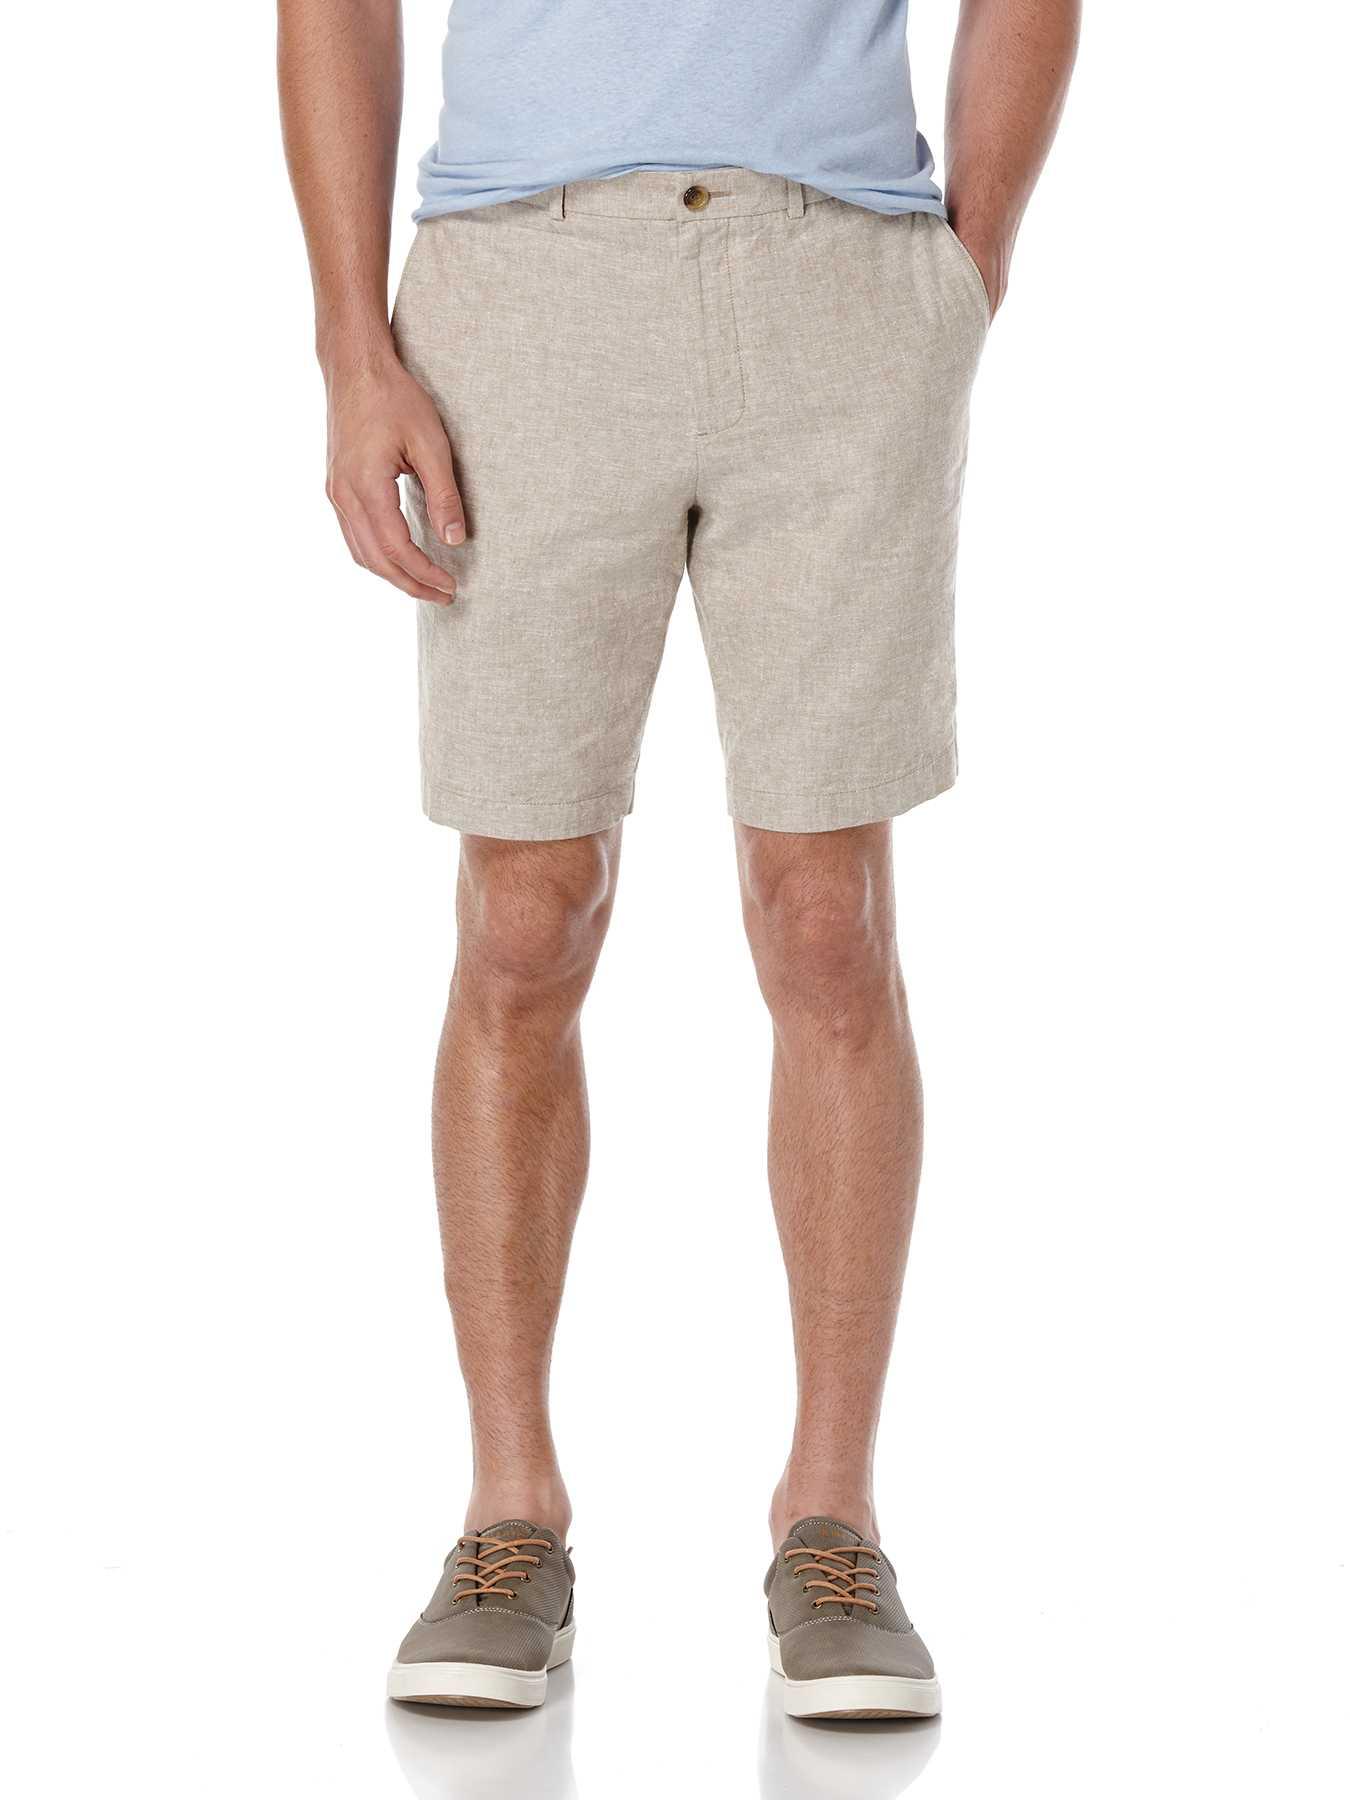 Perry Ellis Linen Cotton Textured Solid Short